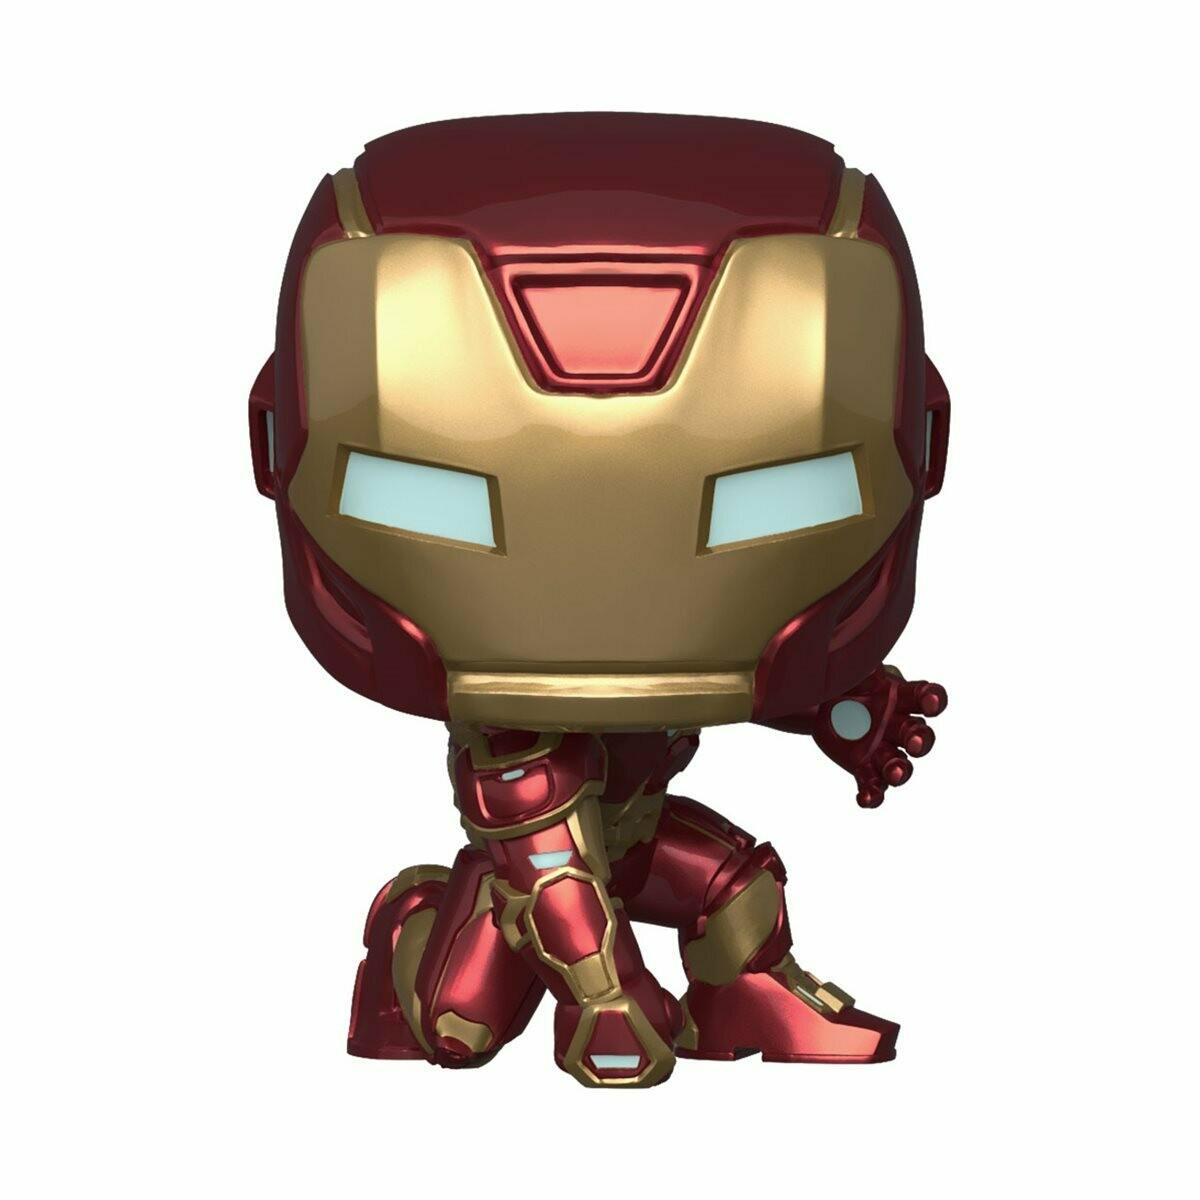 Funko Marvel's Avengers Game Iron-man Pop! Vinyl Figure